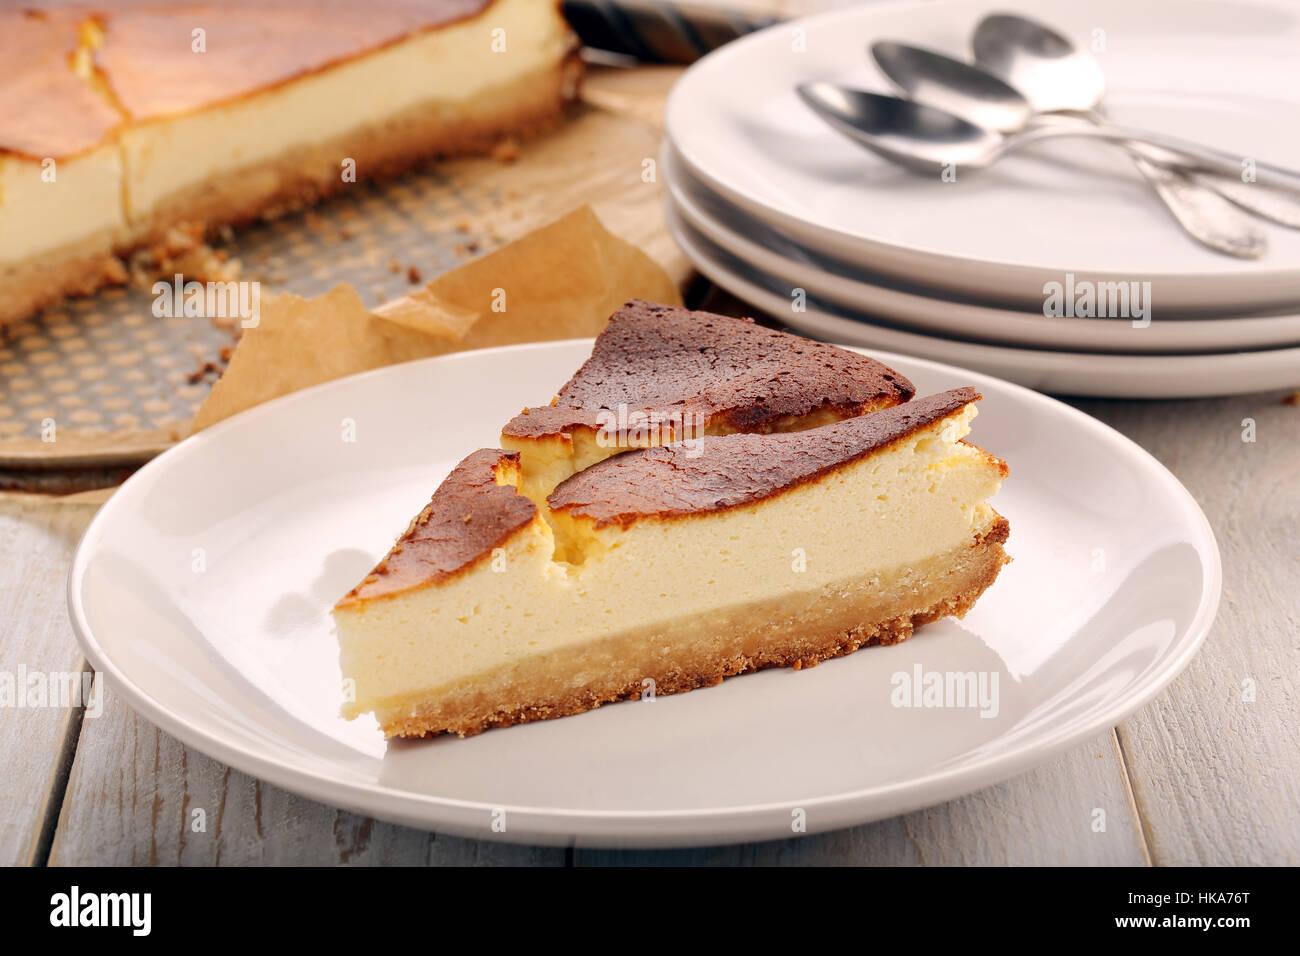 Cheesecake slice on wooden background - Stock Image